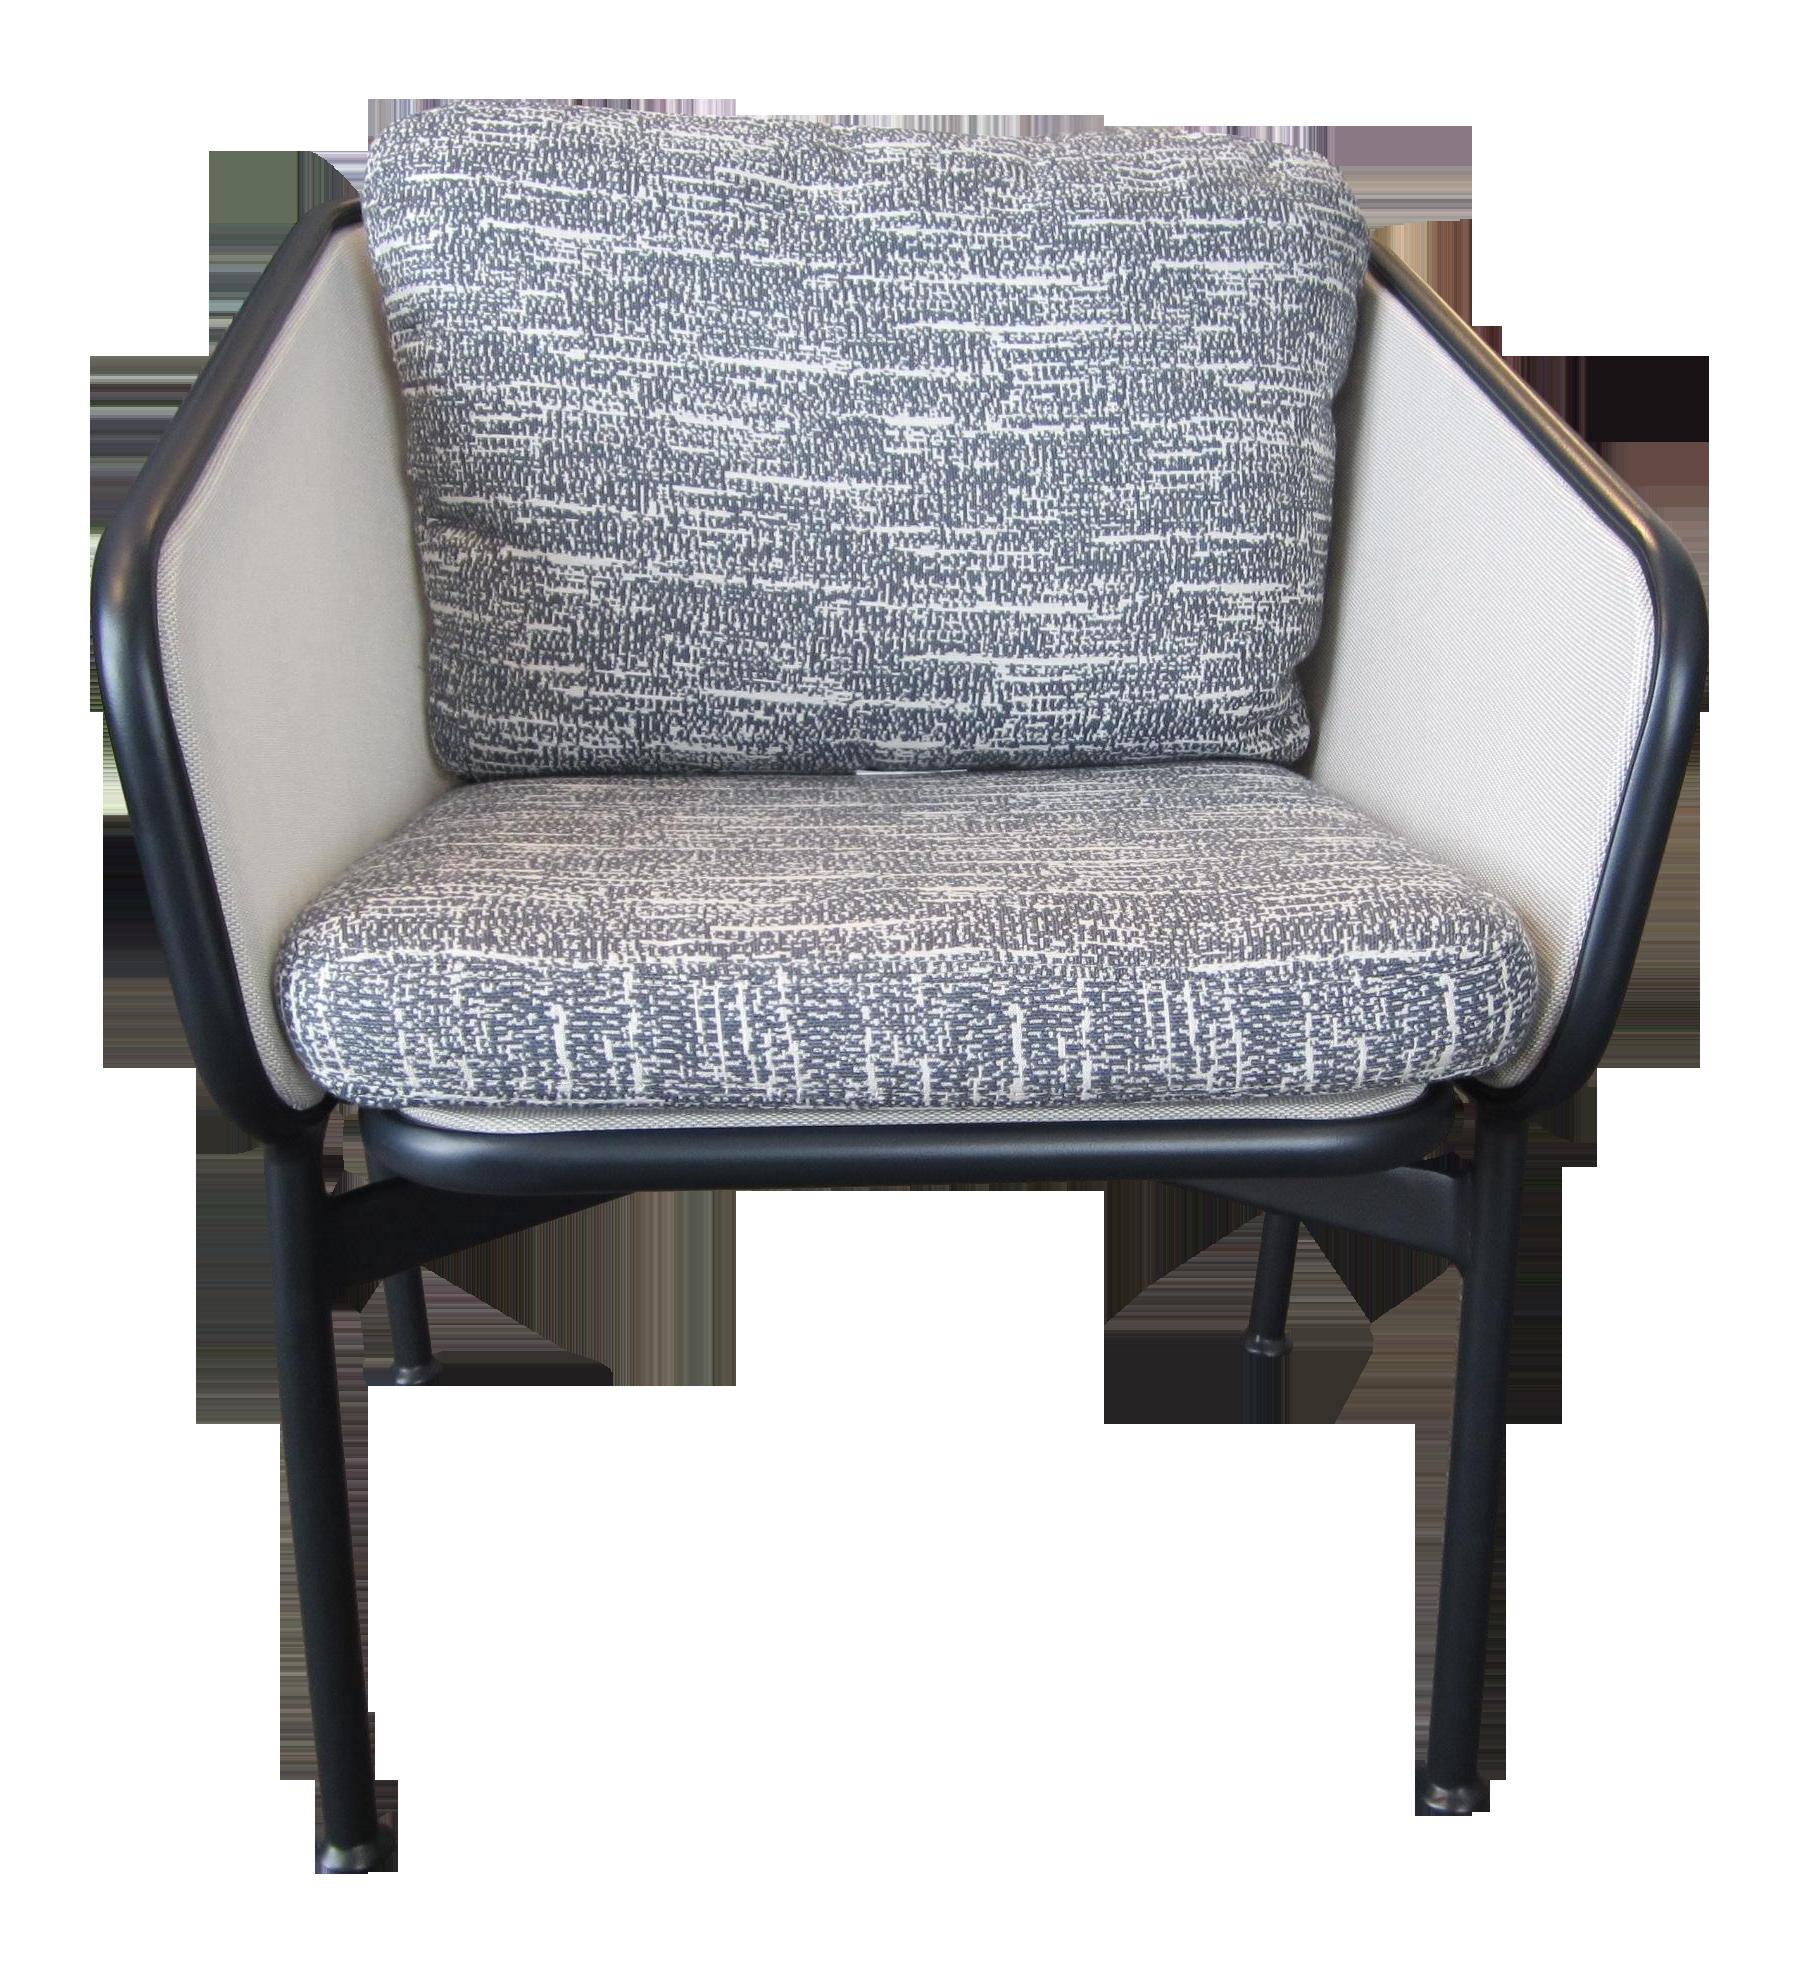 Brown jordan outdoor chair chairish for Brown jordan lawn furniture